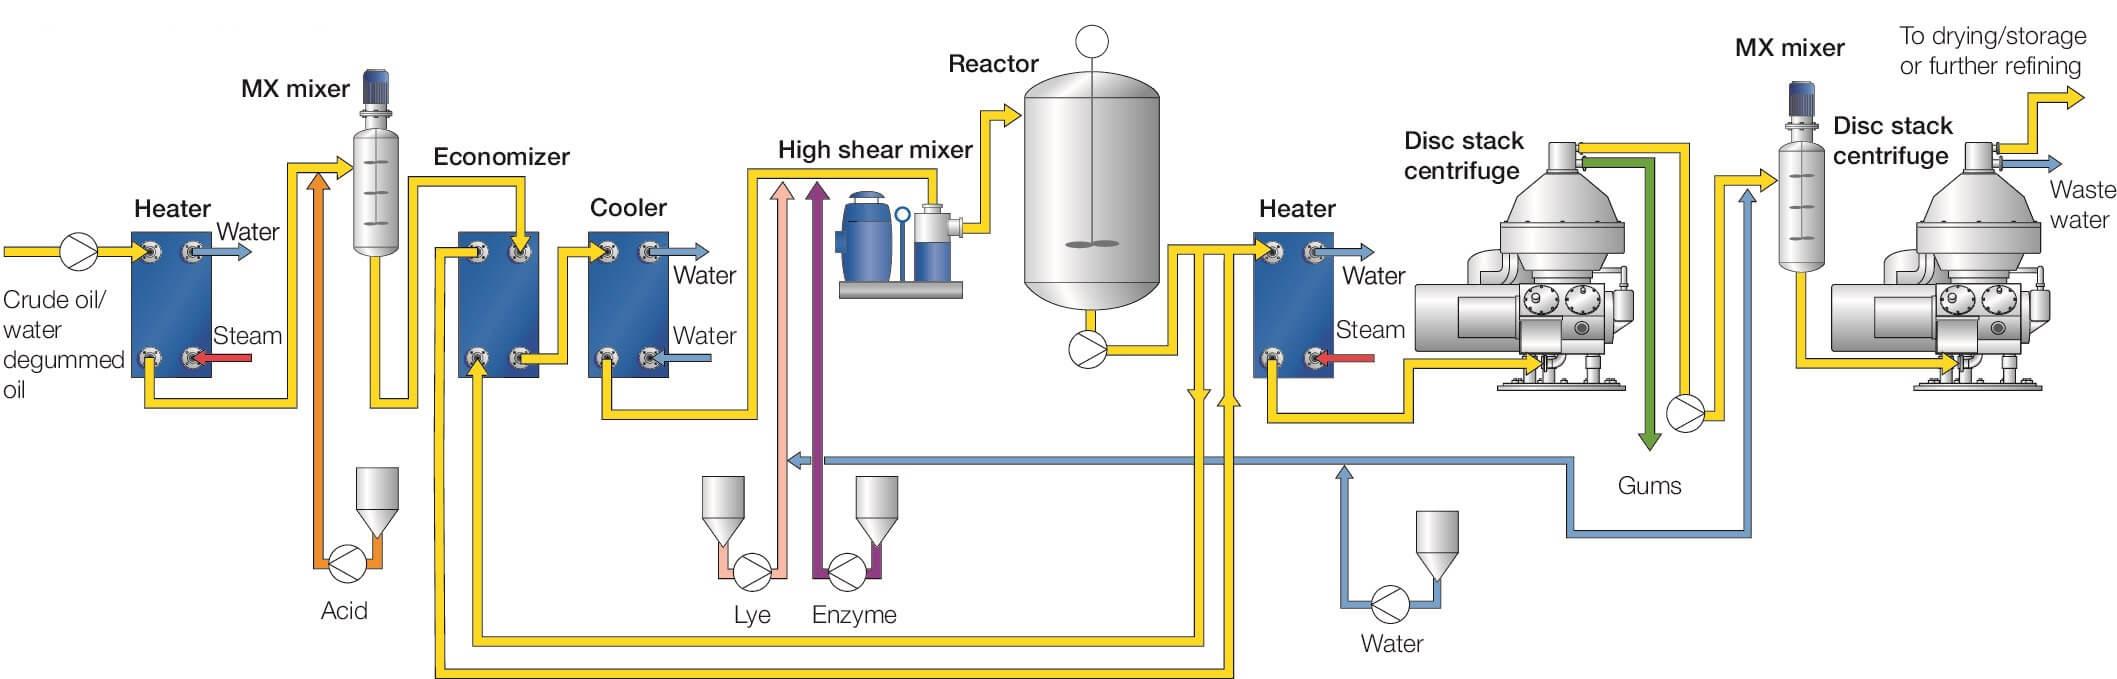 Enzymatic deep degumming process